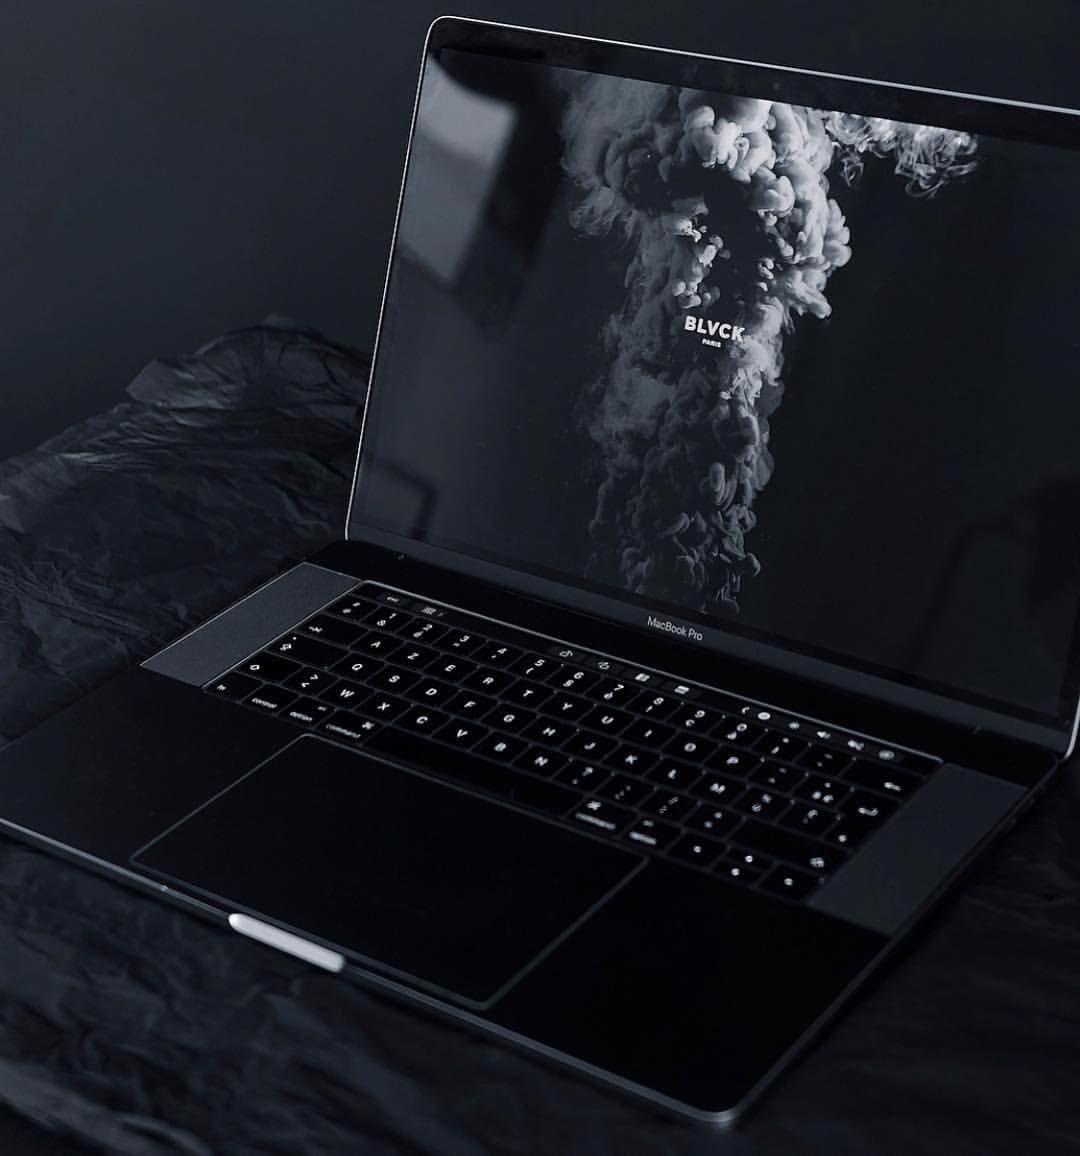 Pin On Macbook Pro Case 13 Inch In 2020 Macbook Pro Cases 13 Inch Macbook Macbook Pro 13 Case